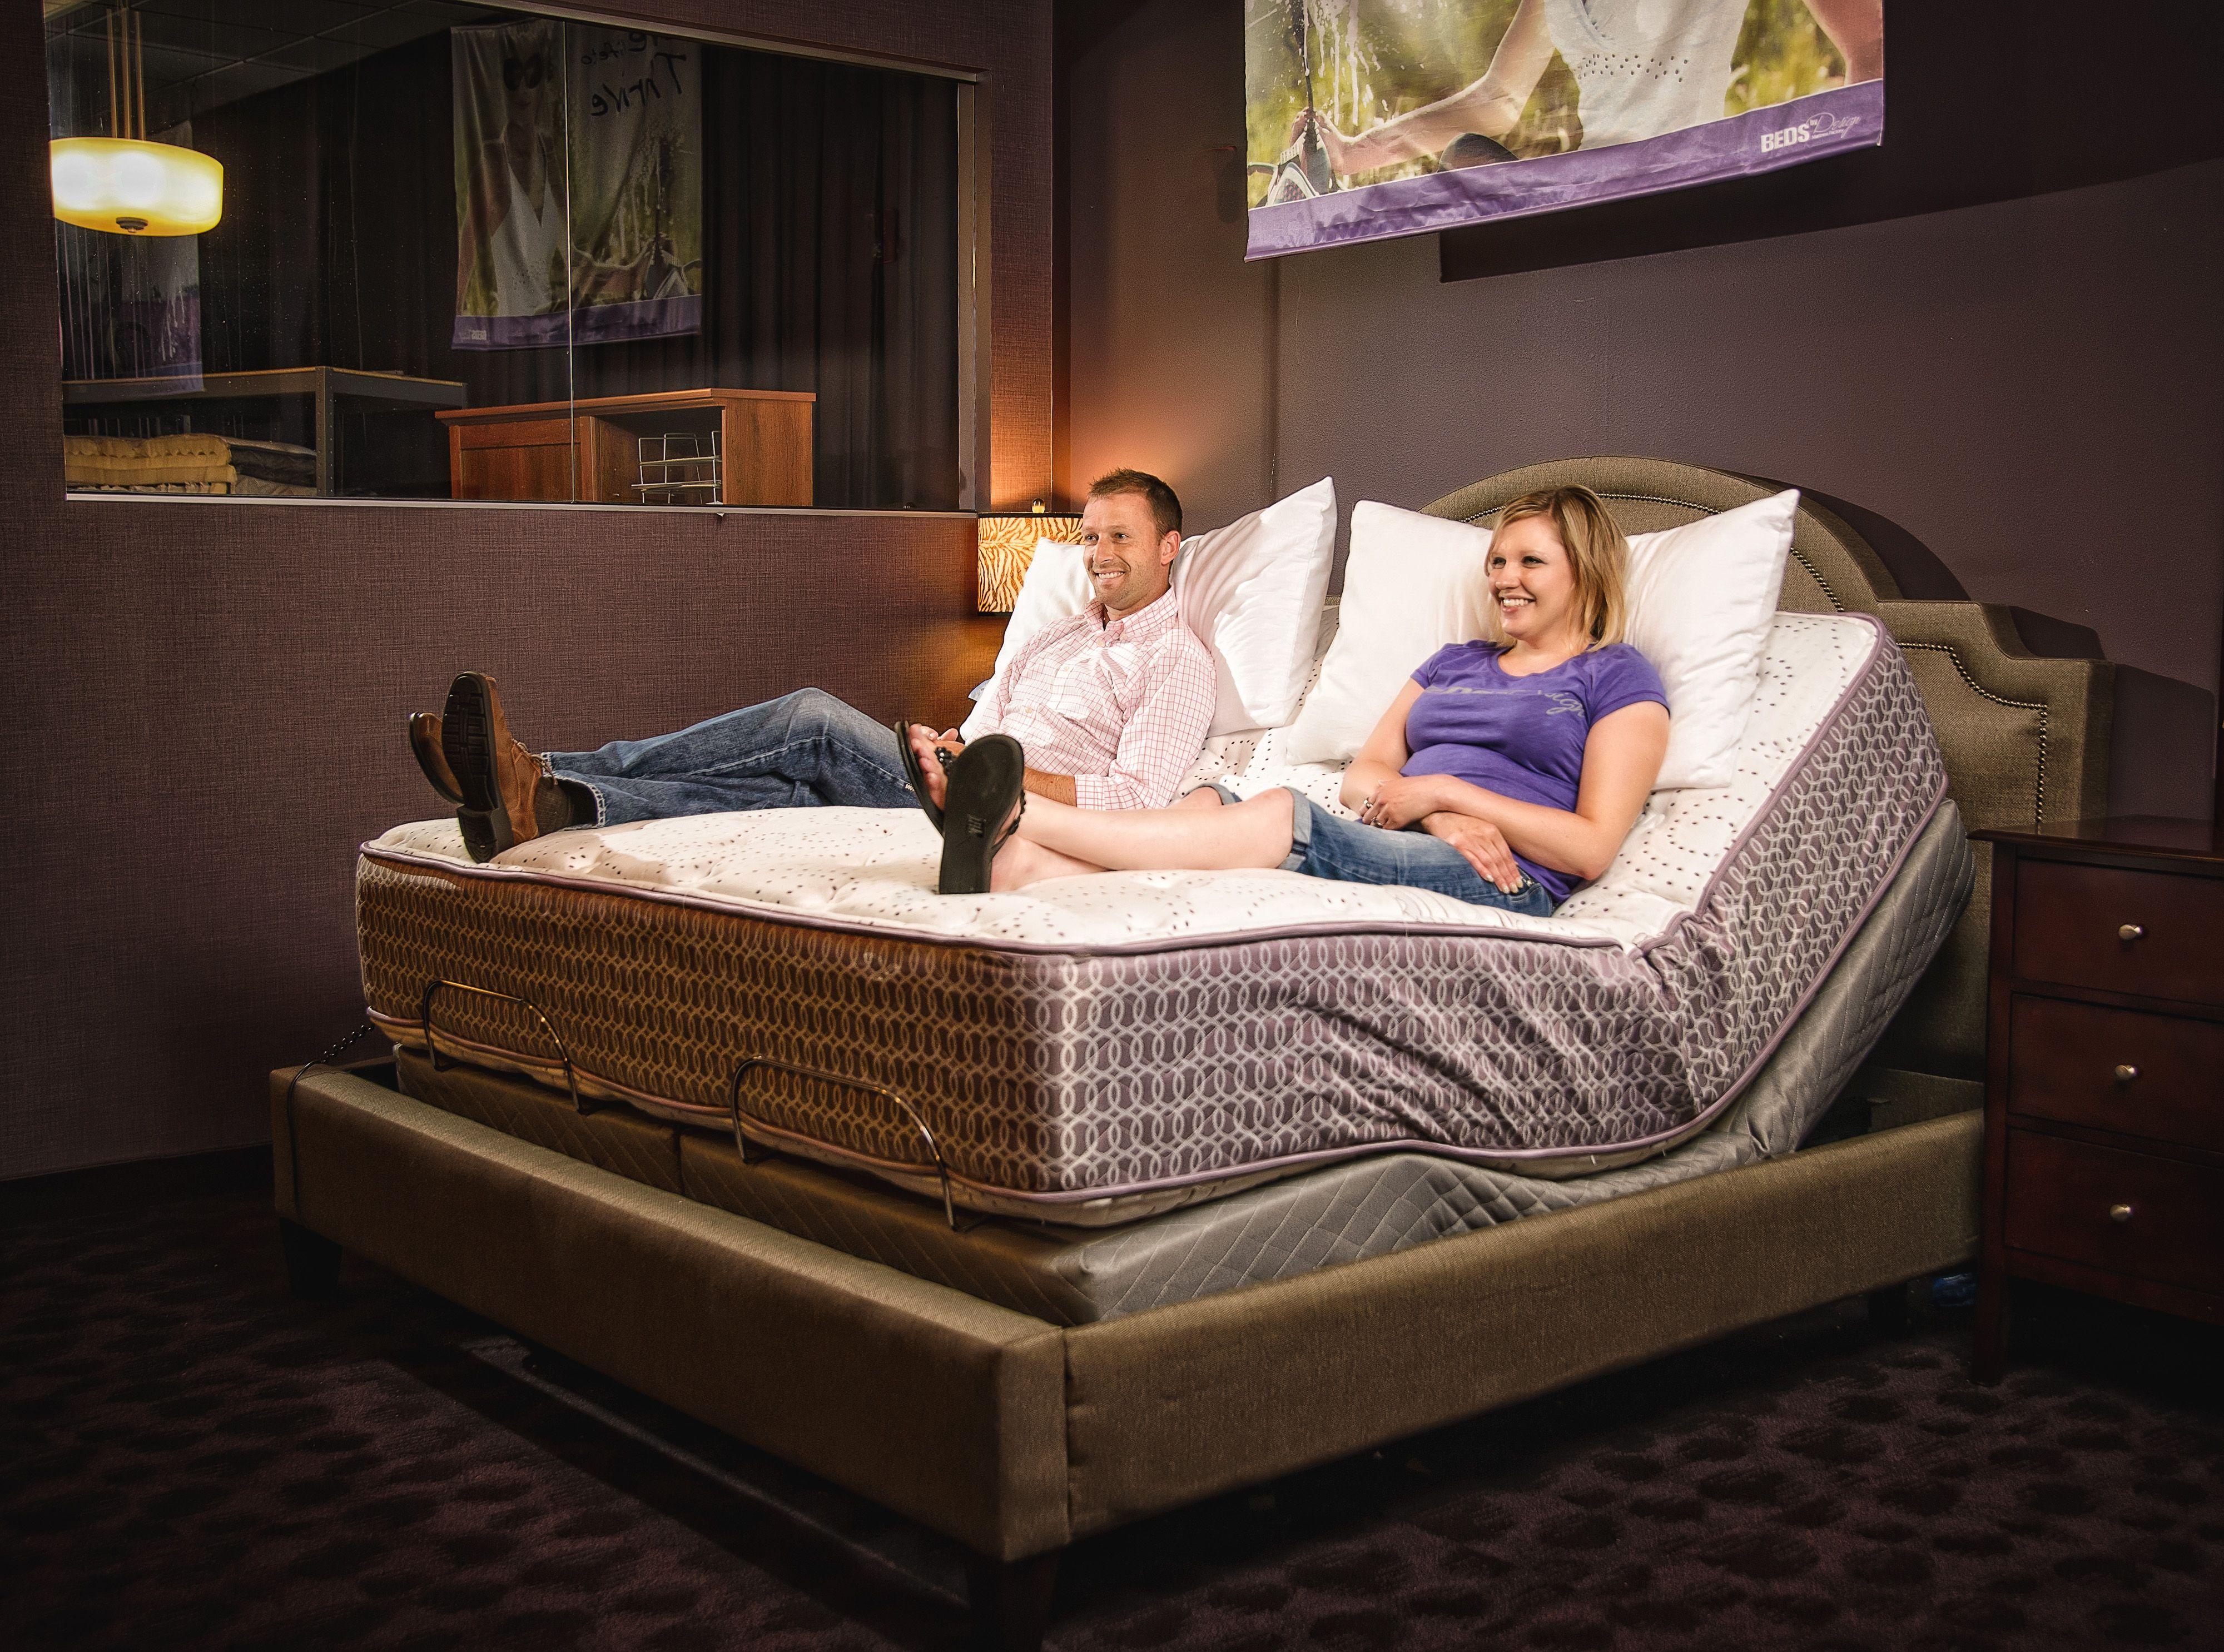 Adjustable Mattresses Bed, Adjustable beds, Mattress